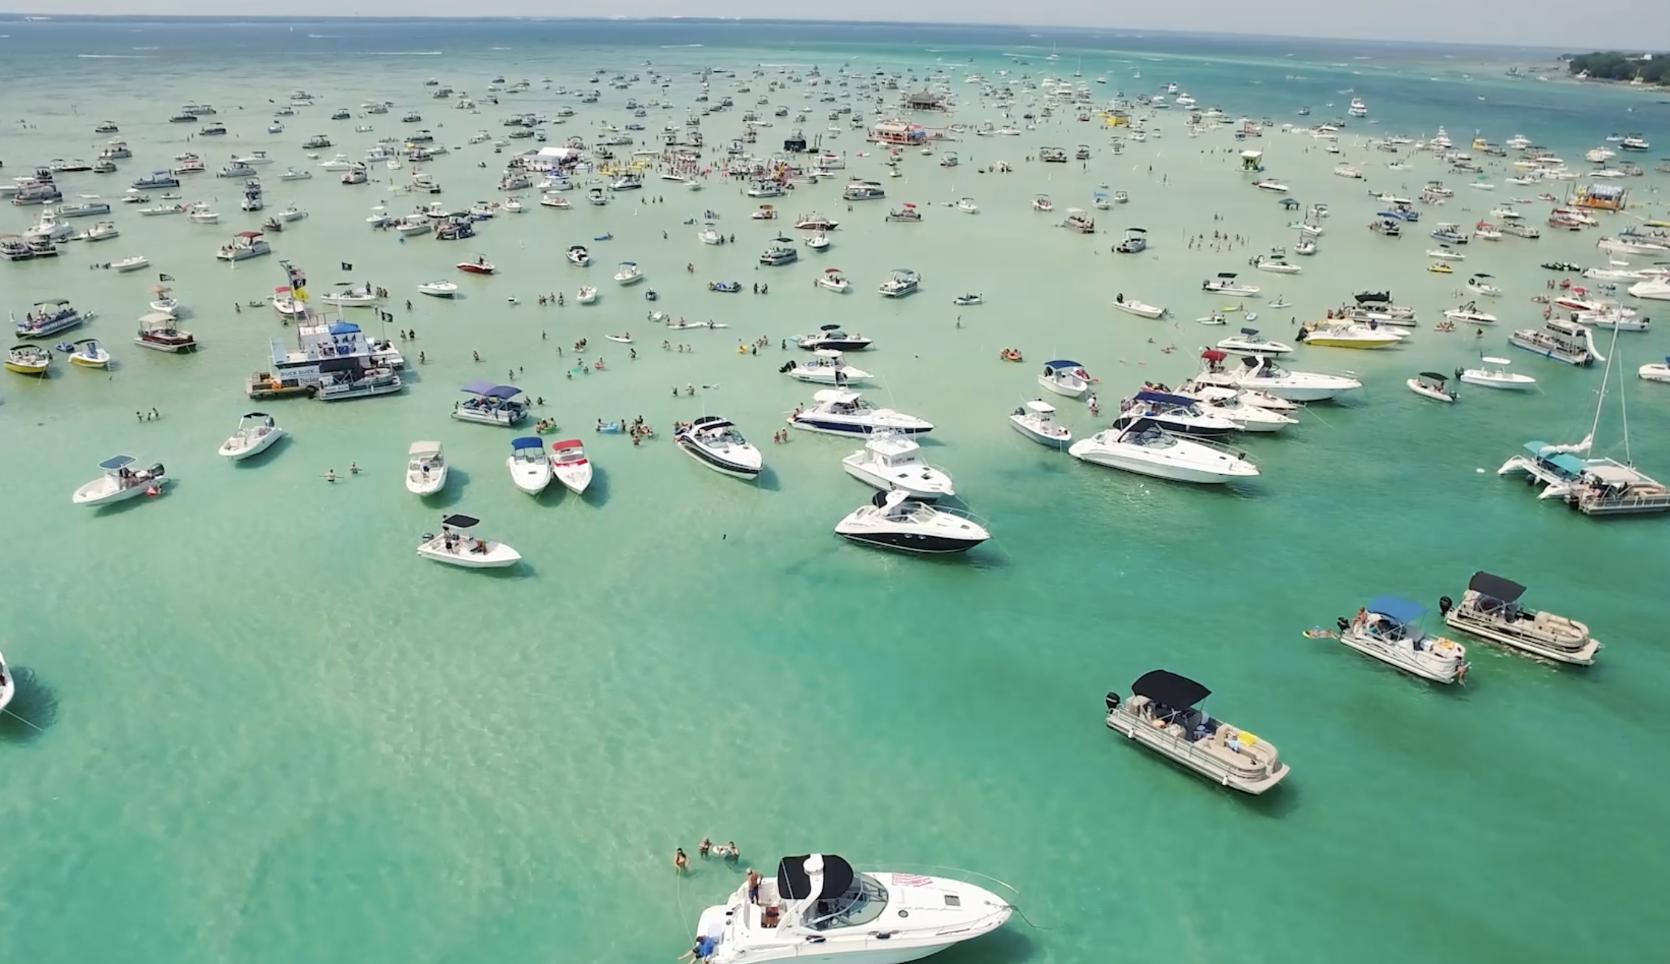 Crab Island Fun Waverunners Pontoon Boats Parasailing In